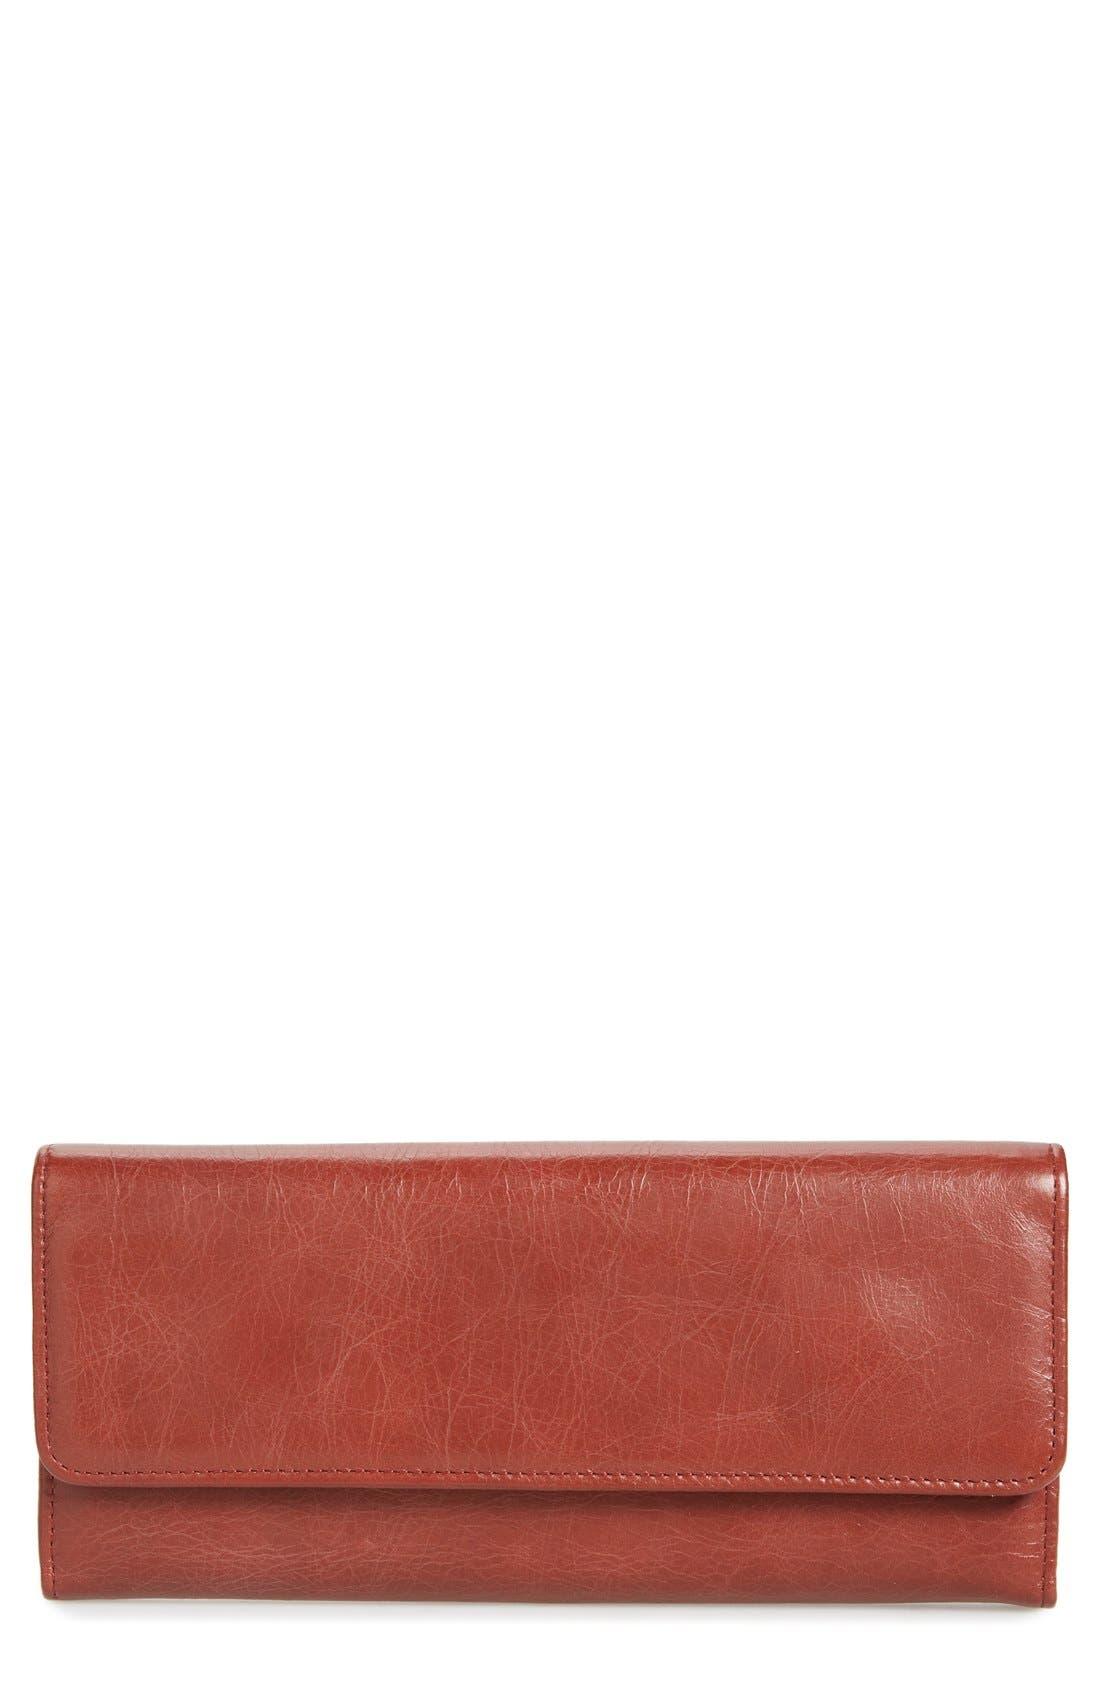 'Sadie' Leather Wallet,                             Main thumbnail 25, color,